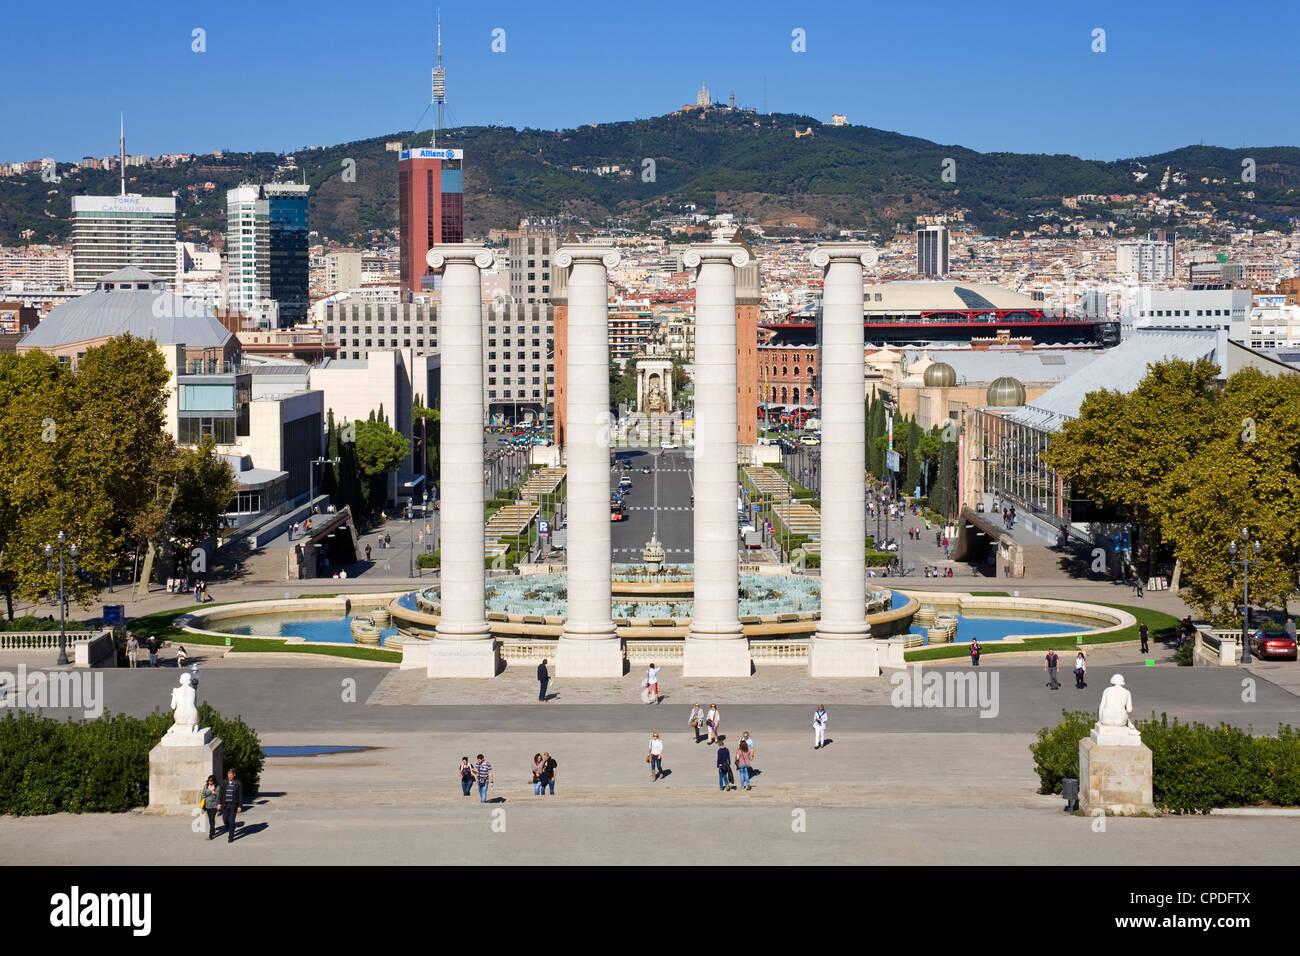 L'avenue Reina Maria Cristina dans le quartier Montjuic, Barcelone, Catalogne, Espagne, Europe Photo Stock